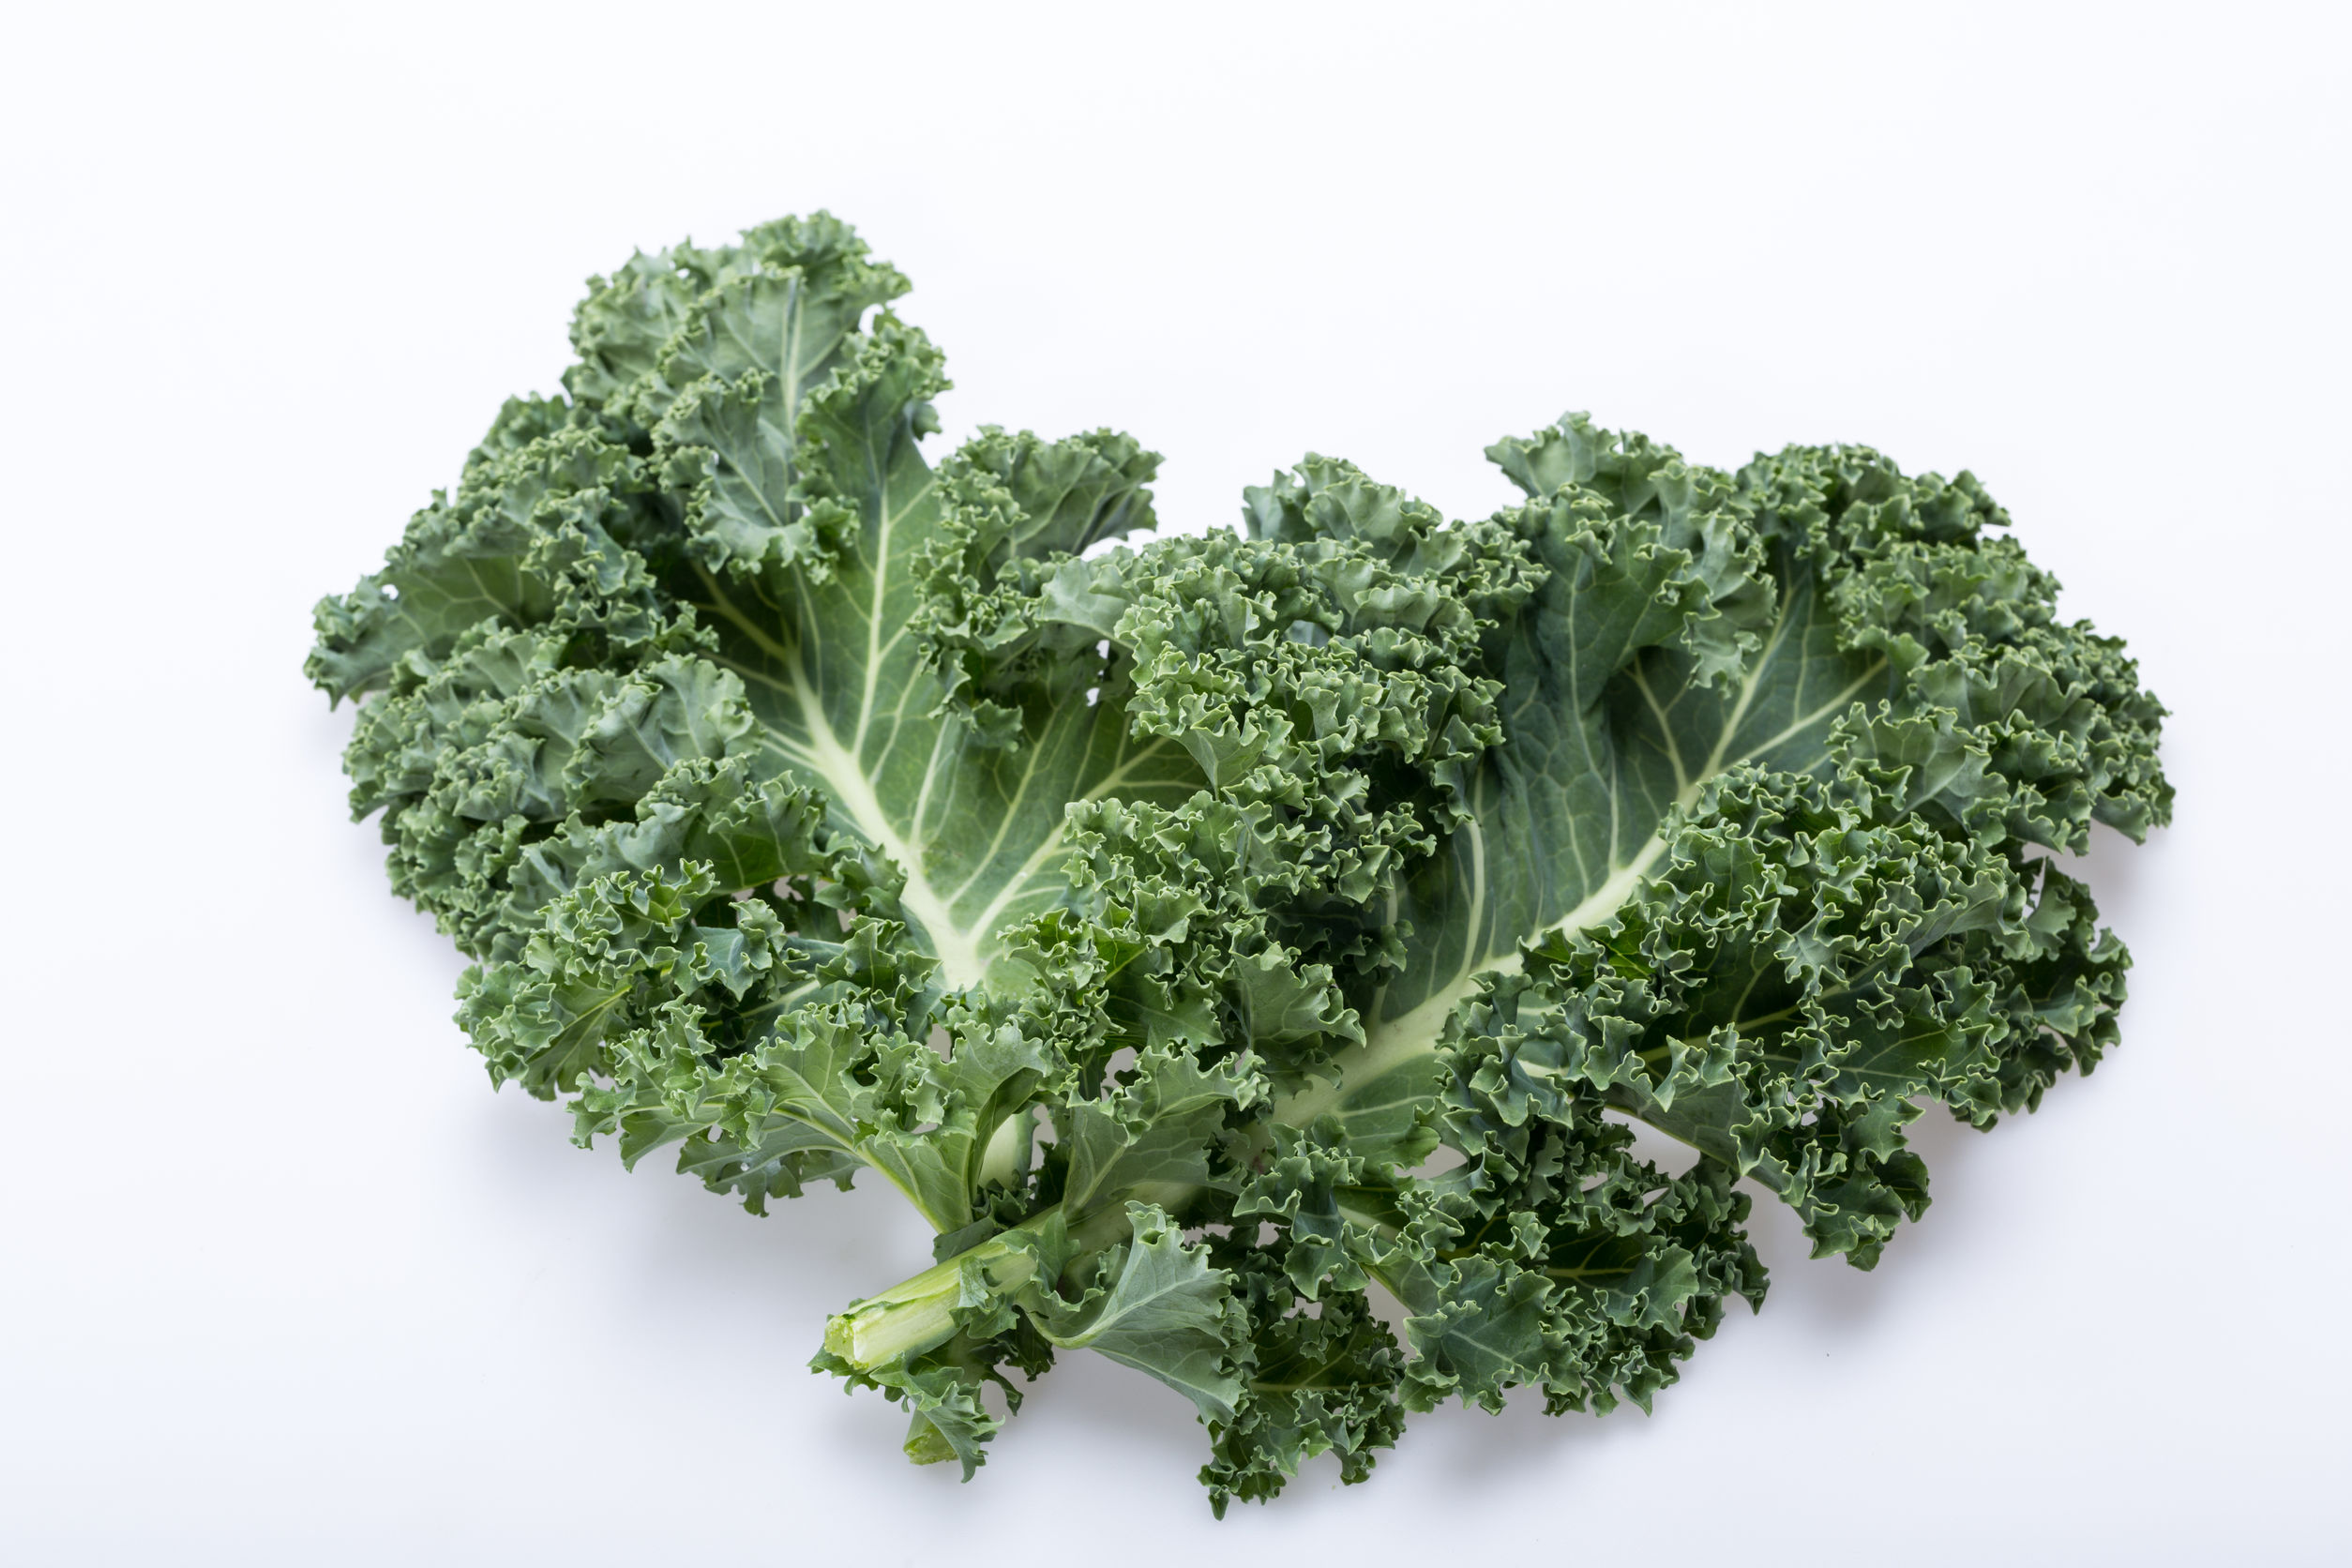 kale health benefits